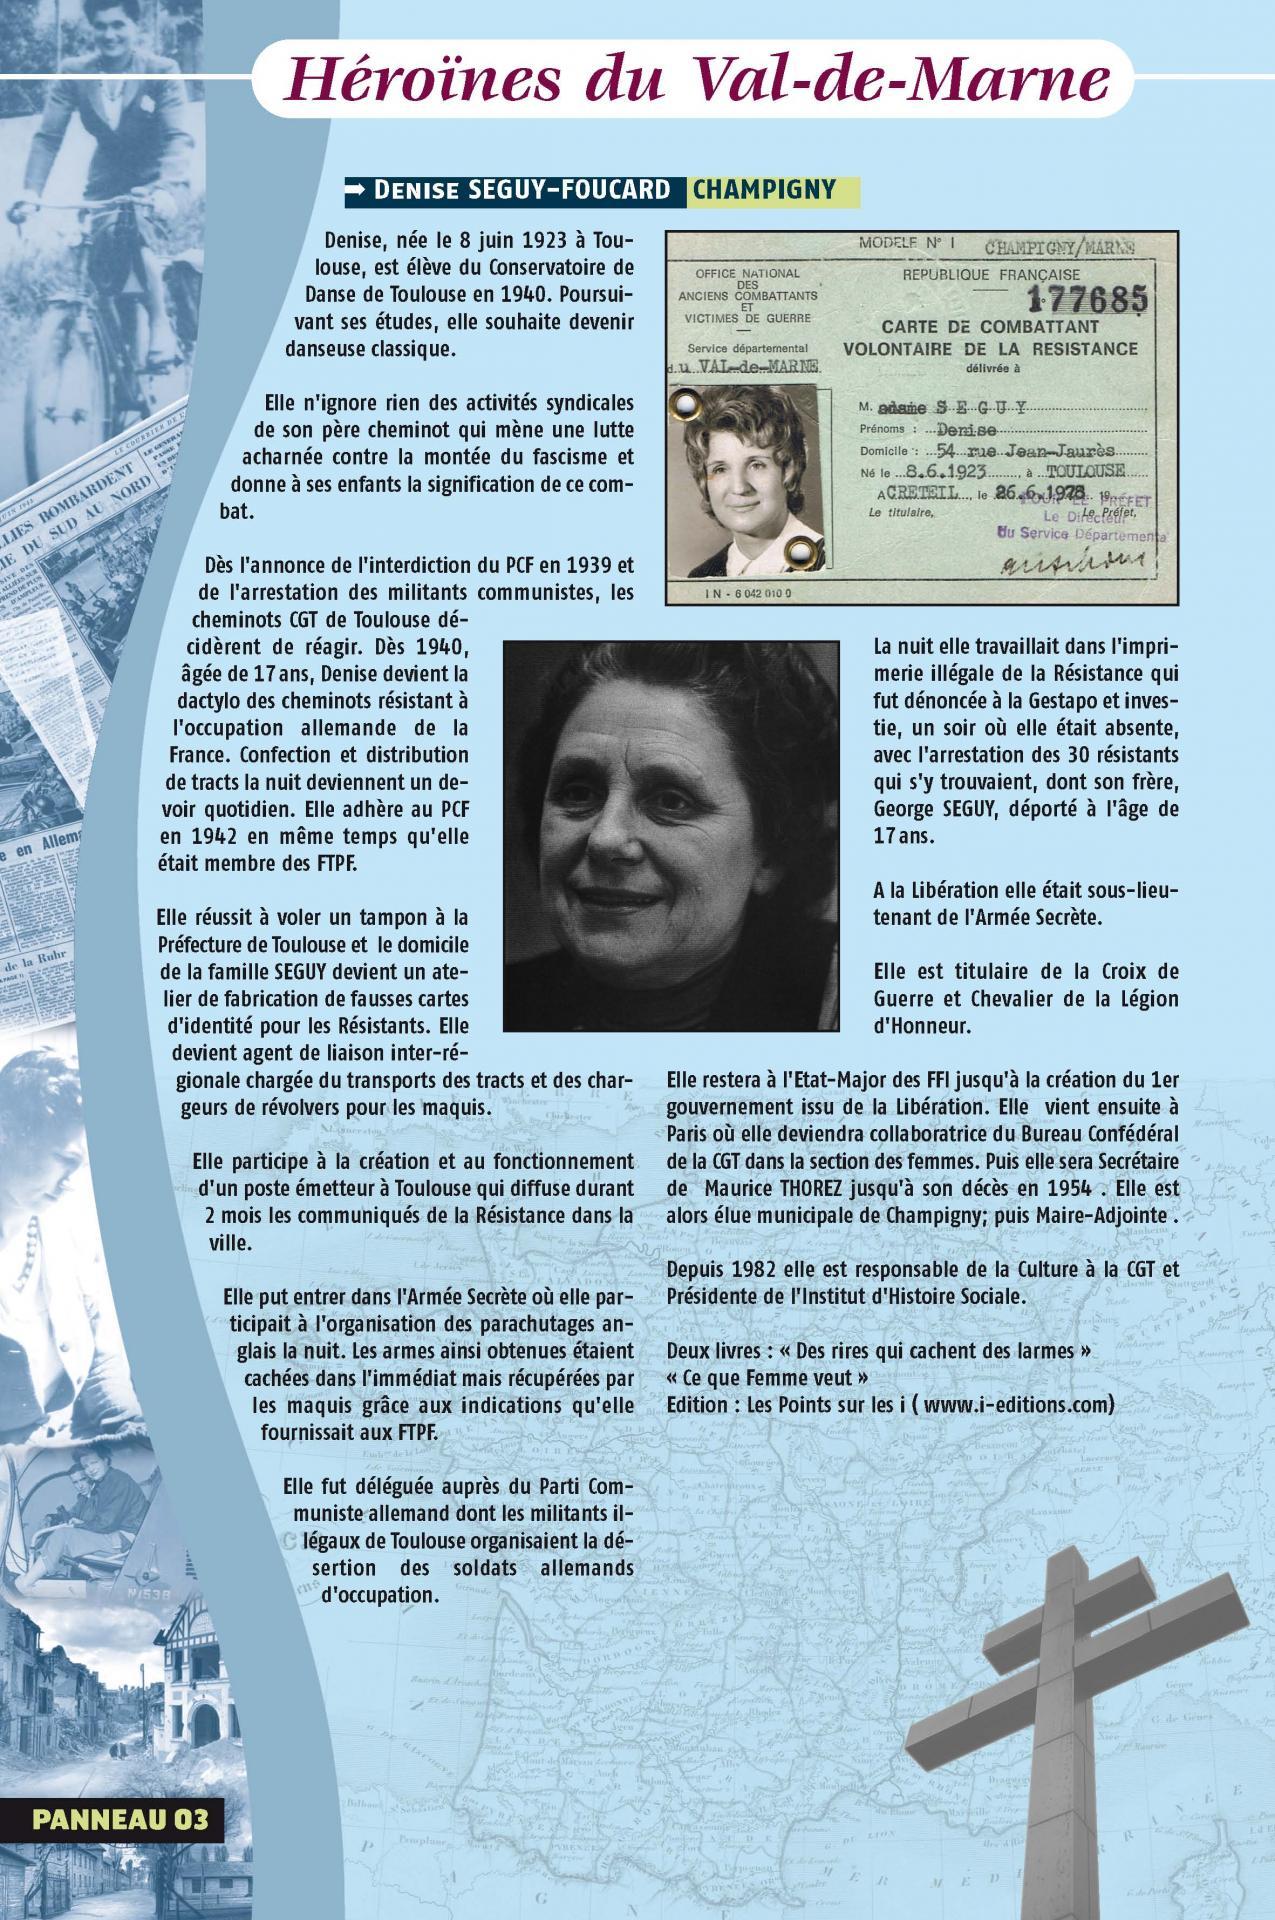 Pano3 4 page 1